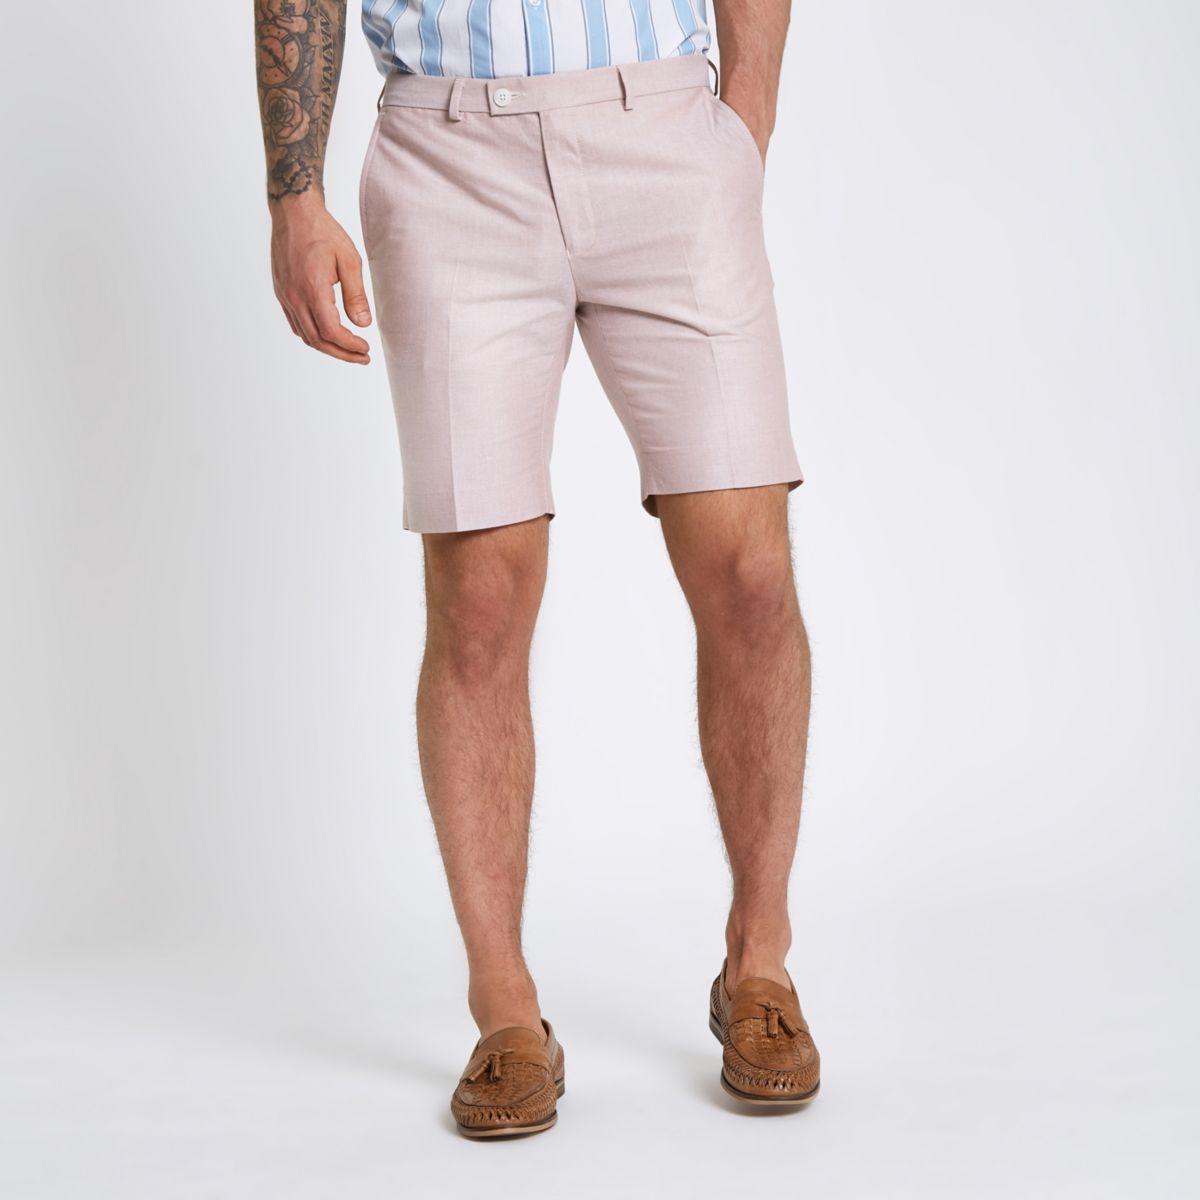 Pink smart shorts